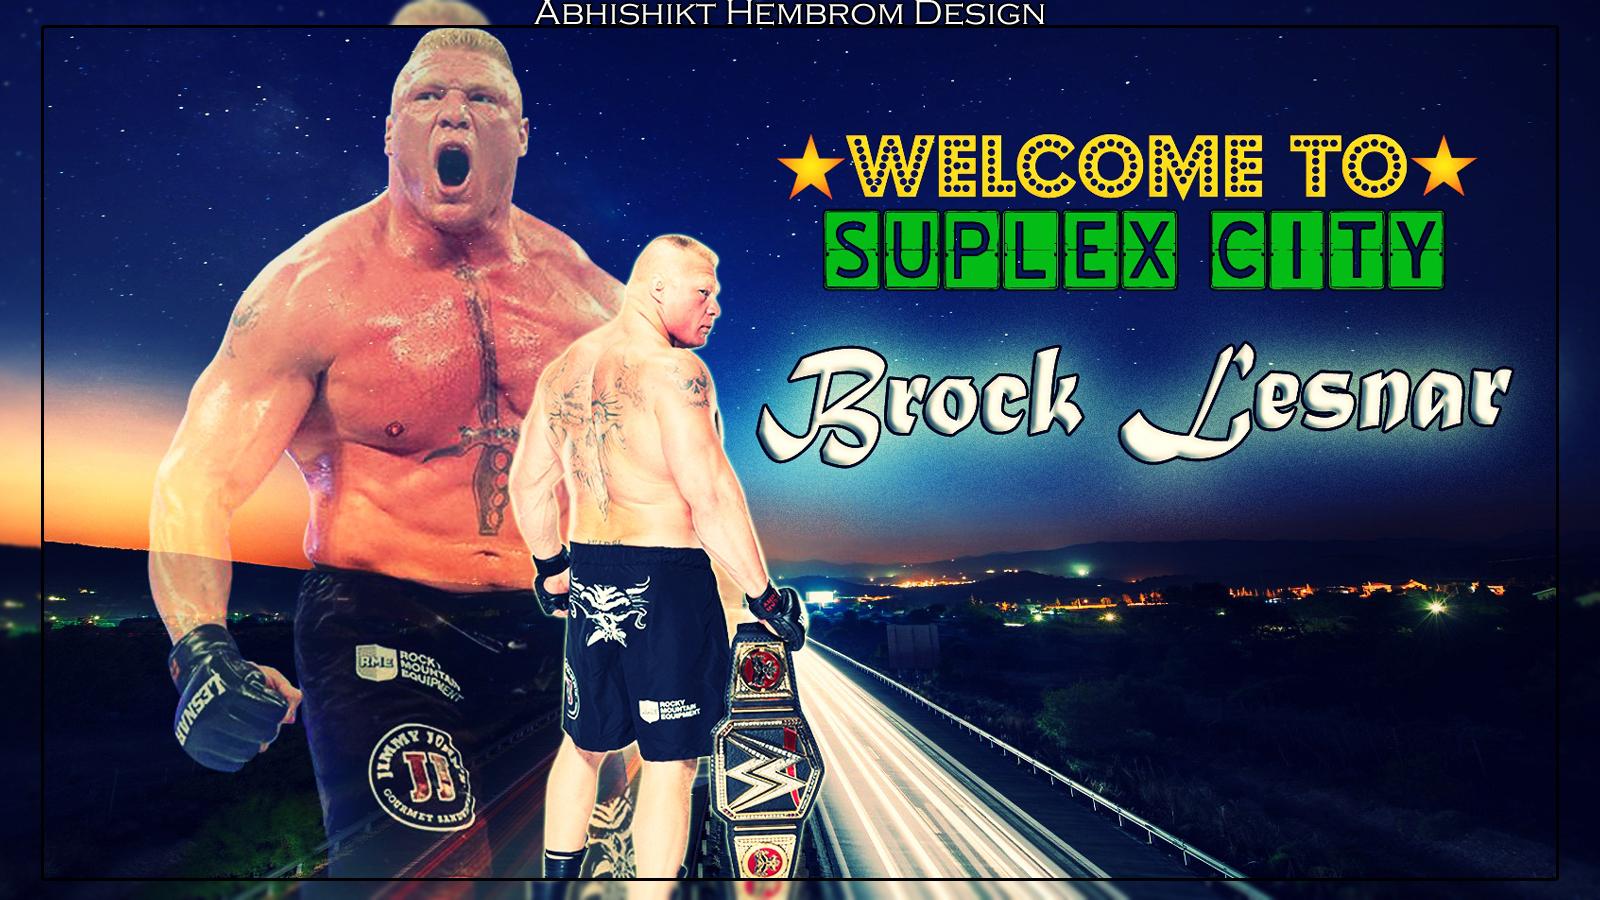 Brock Lesnar Wallpaper By Abhishikt